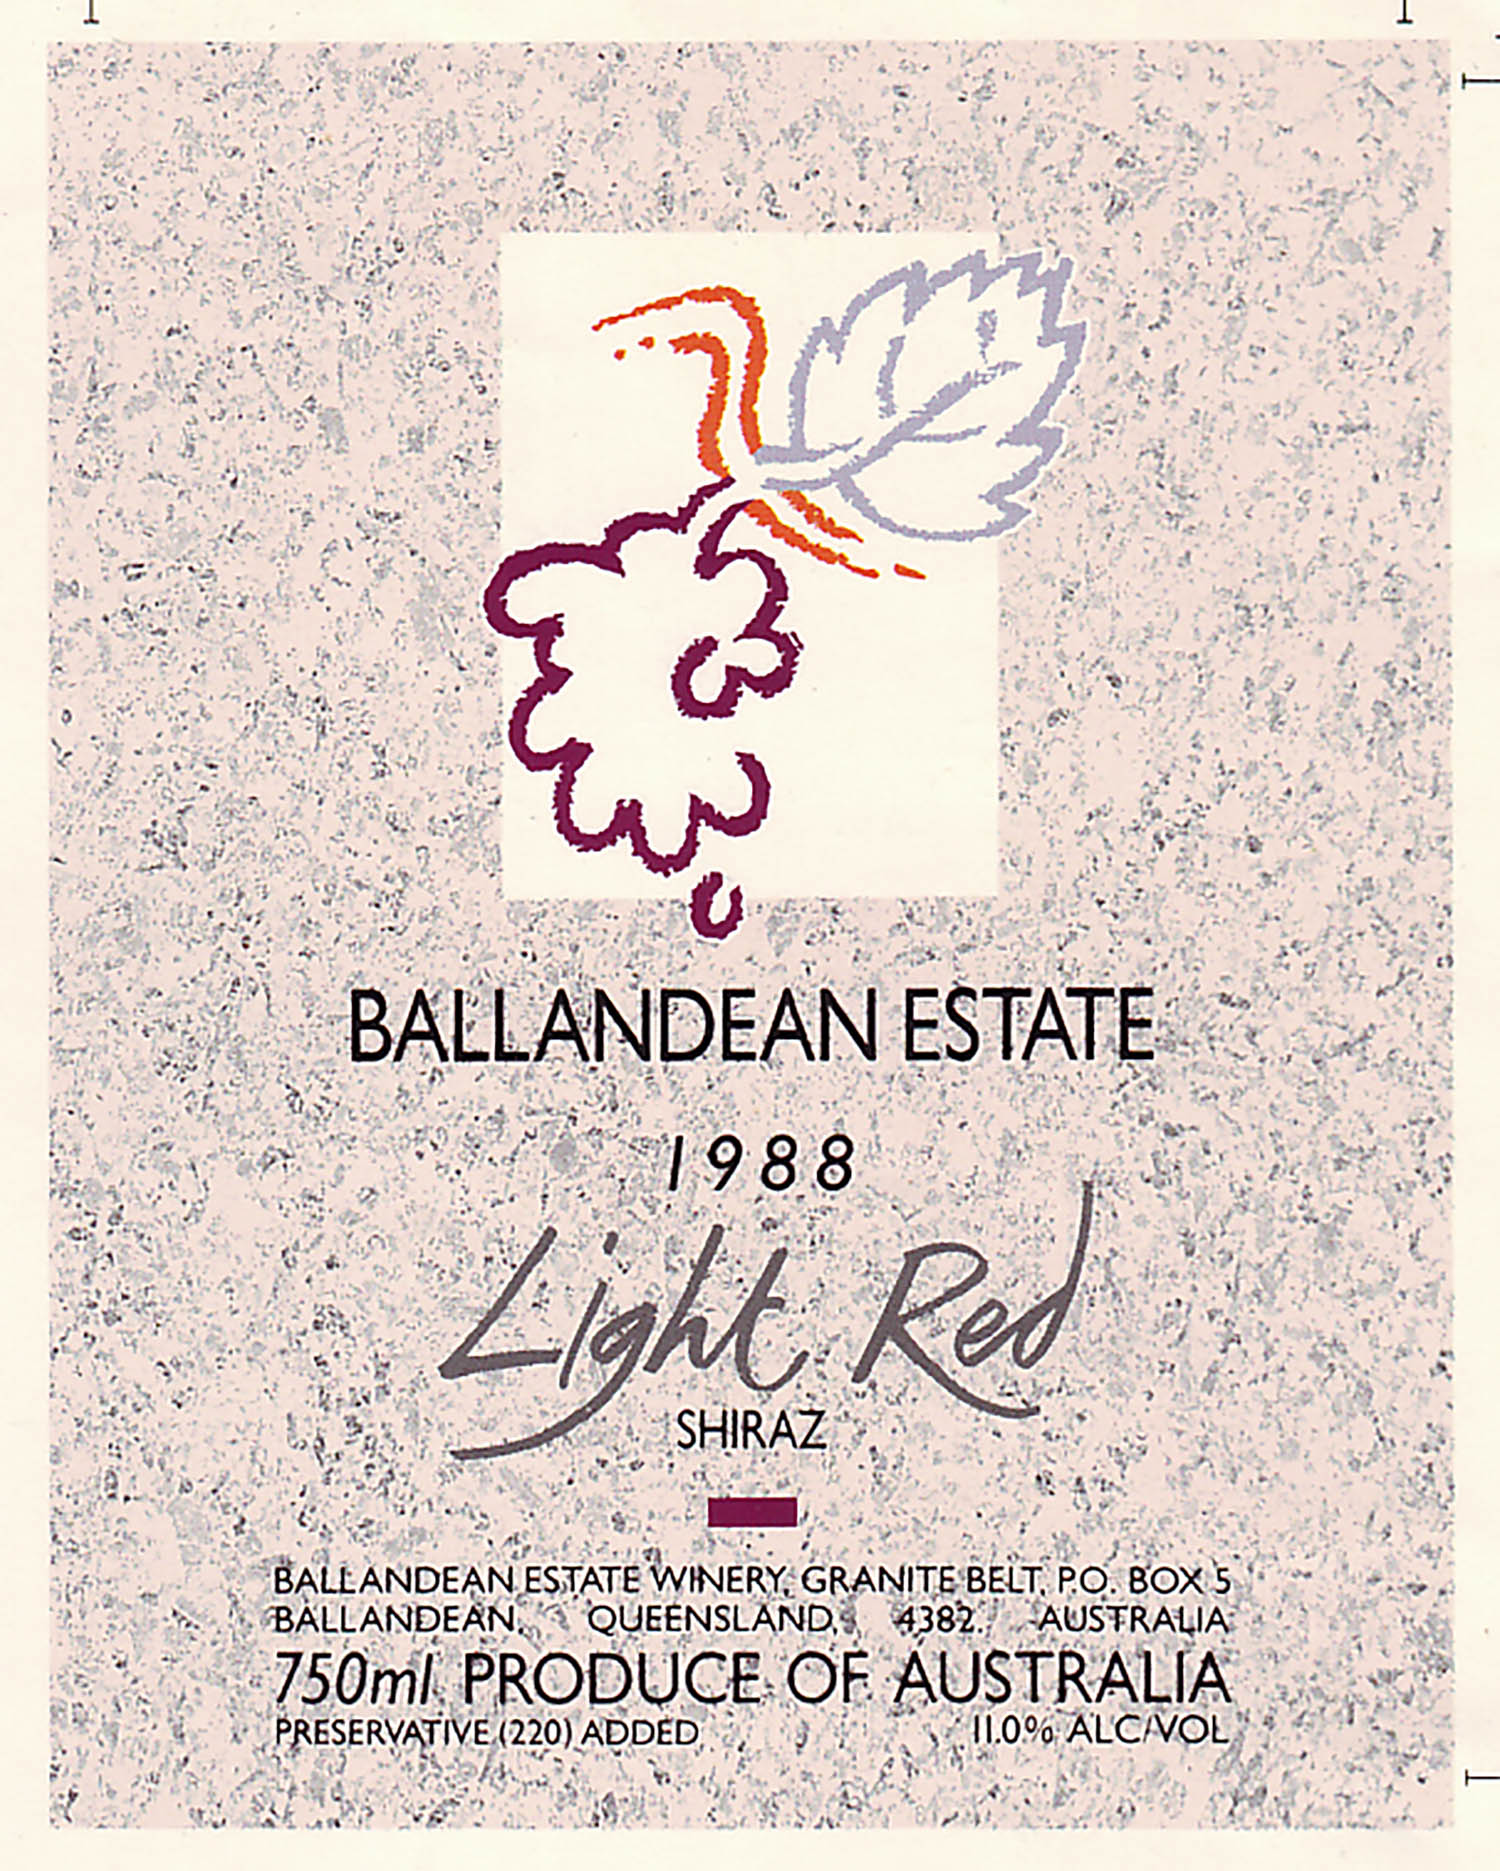 ballendean_estate.jpg